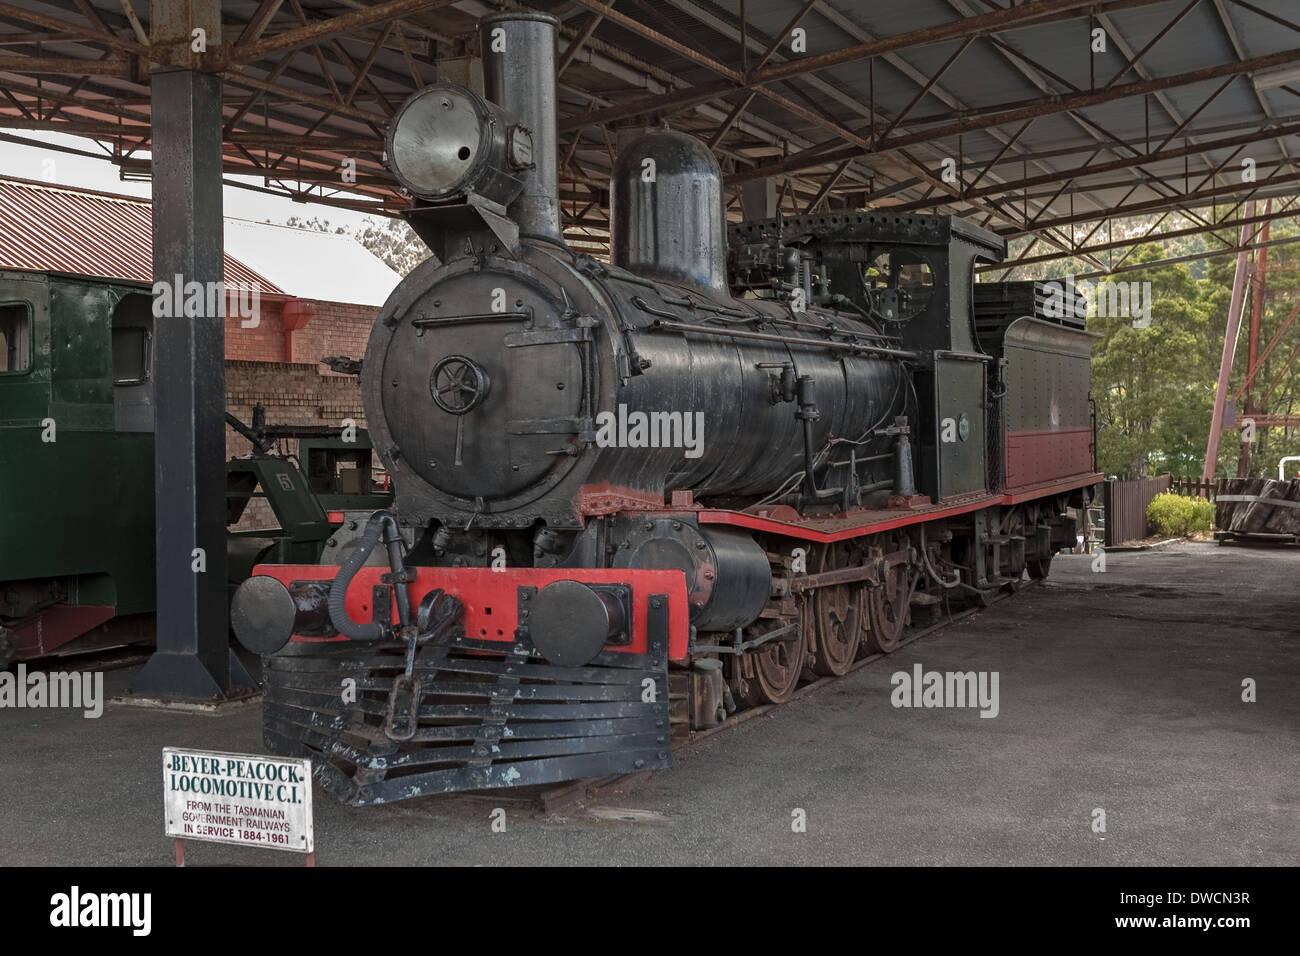 Beyer-Peacock Locomotive Zeehan Tasmania Australia - Stock Image